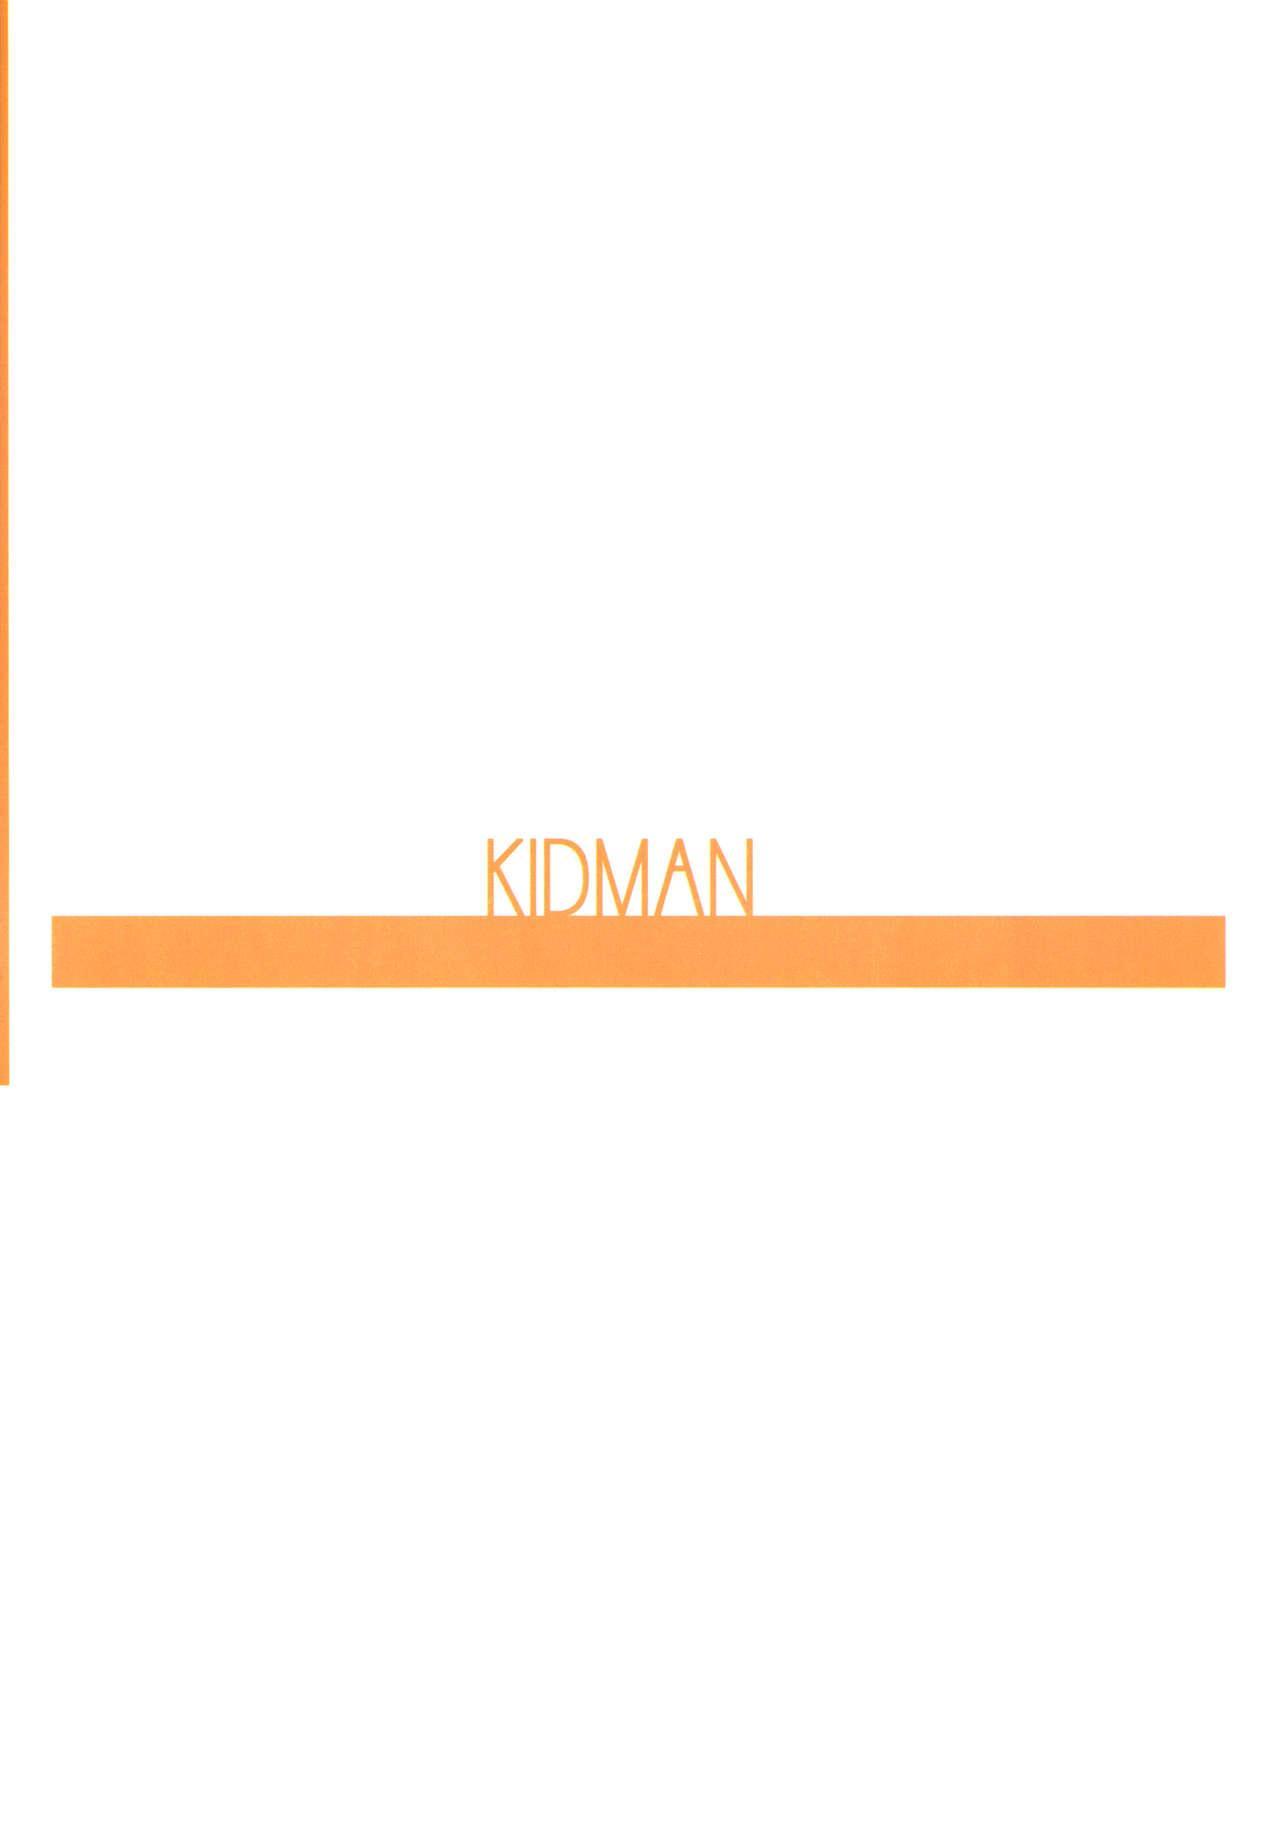 KIDMAN 17